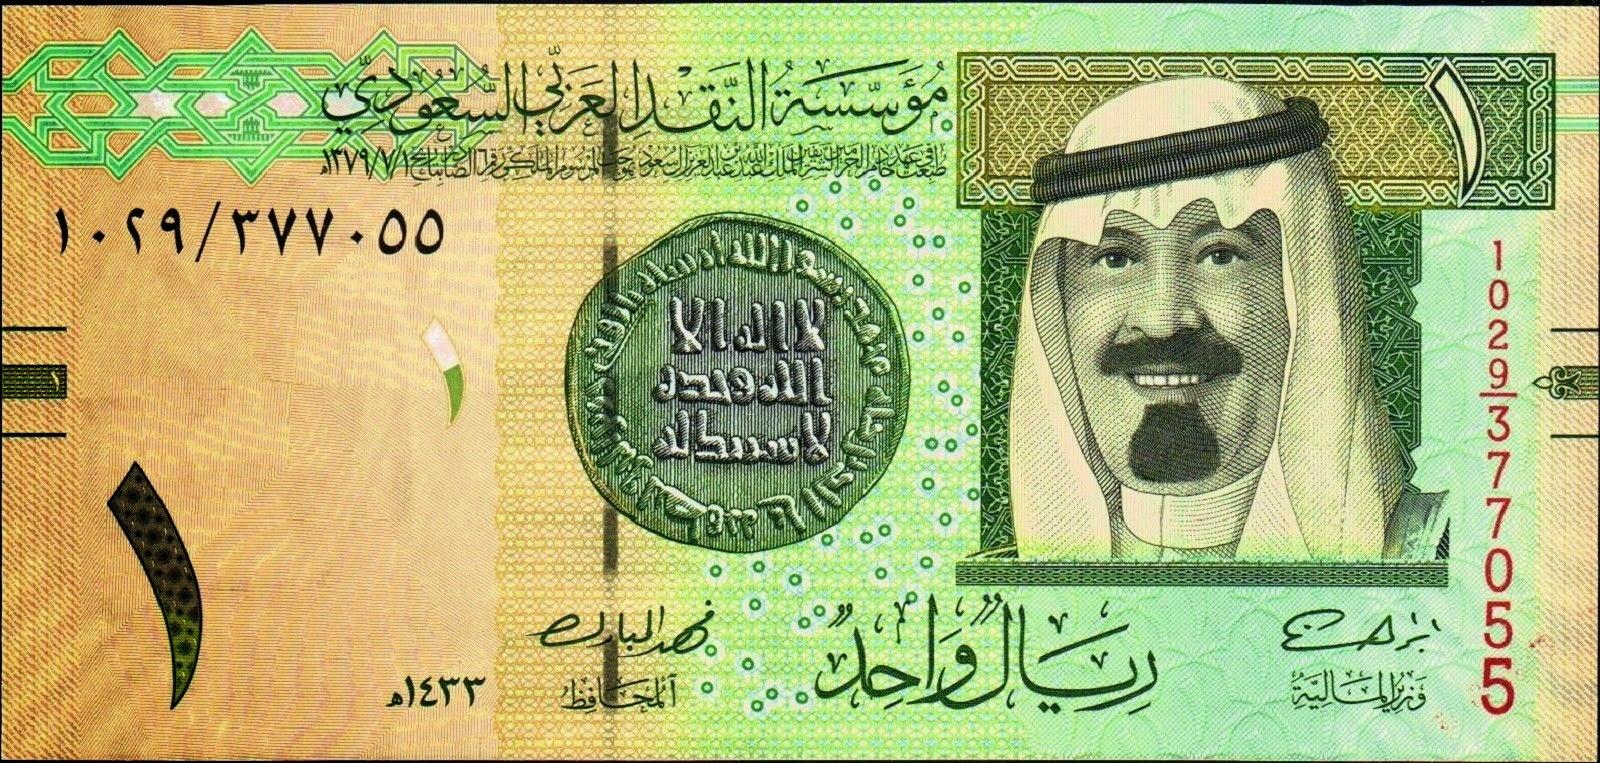 1 Saudi Riyal Note 2012|World Banknotes & Coins Pictures ... Saudi Money 100